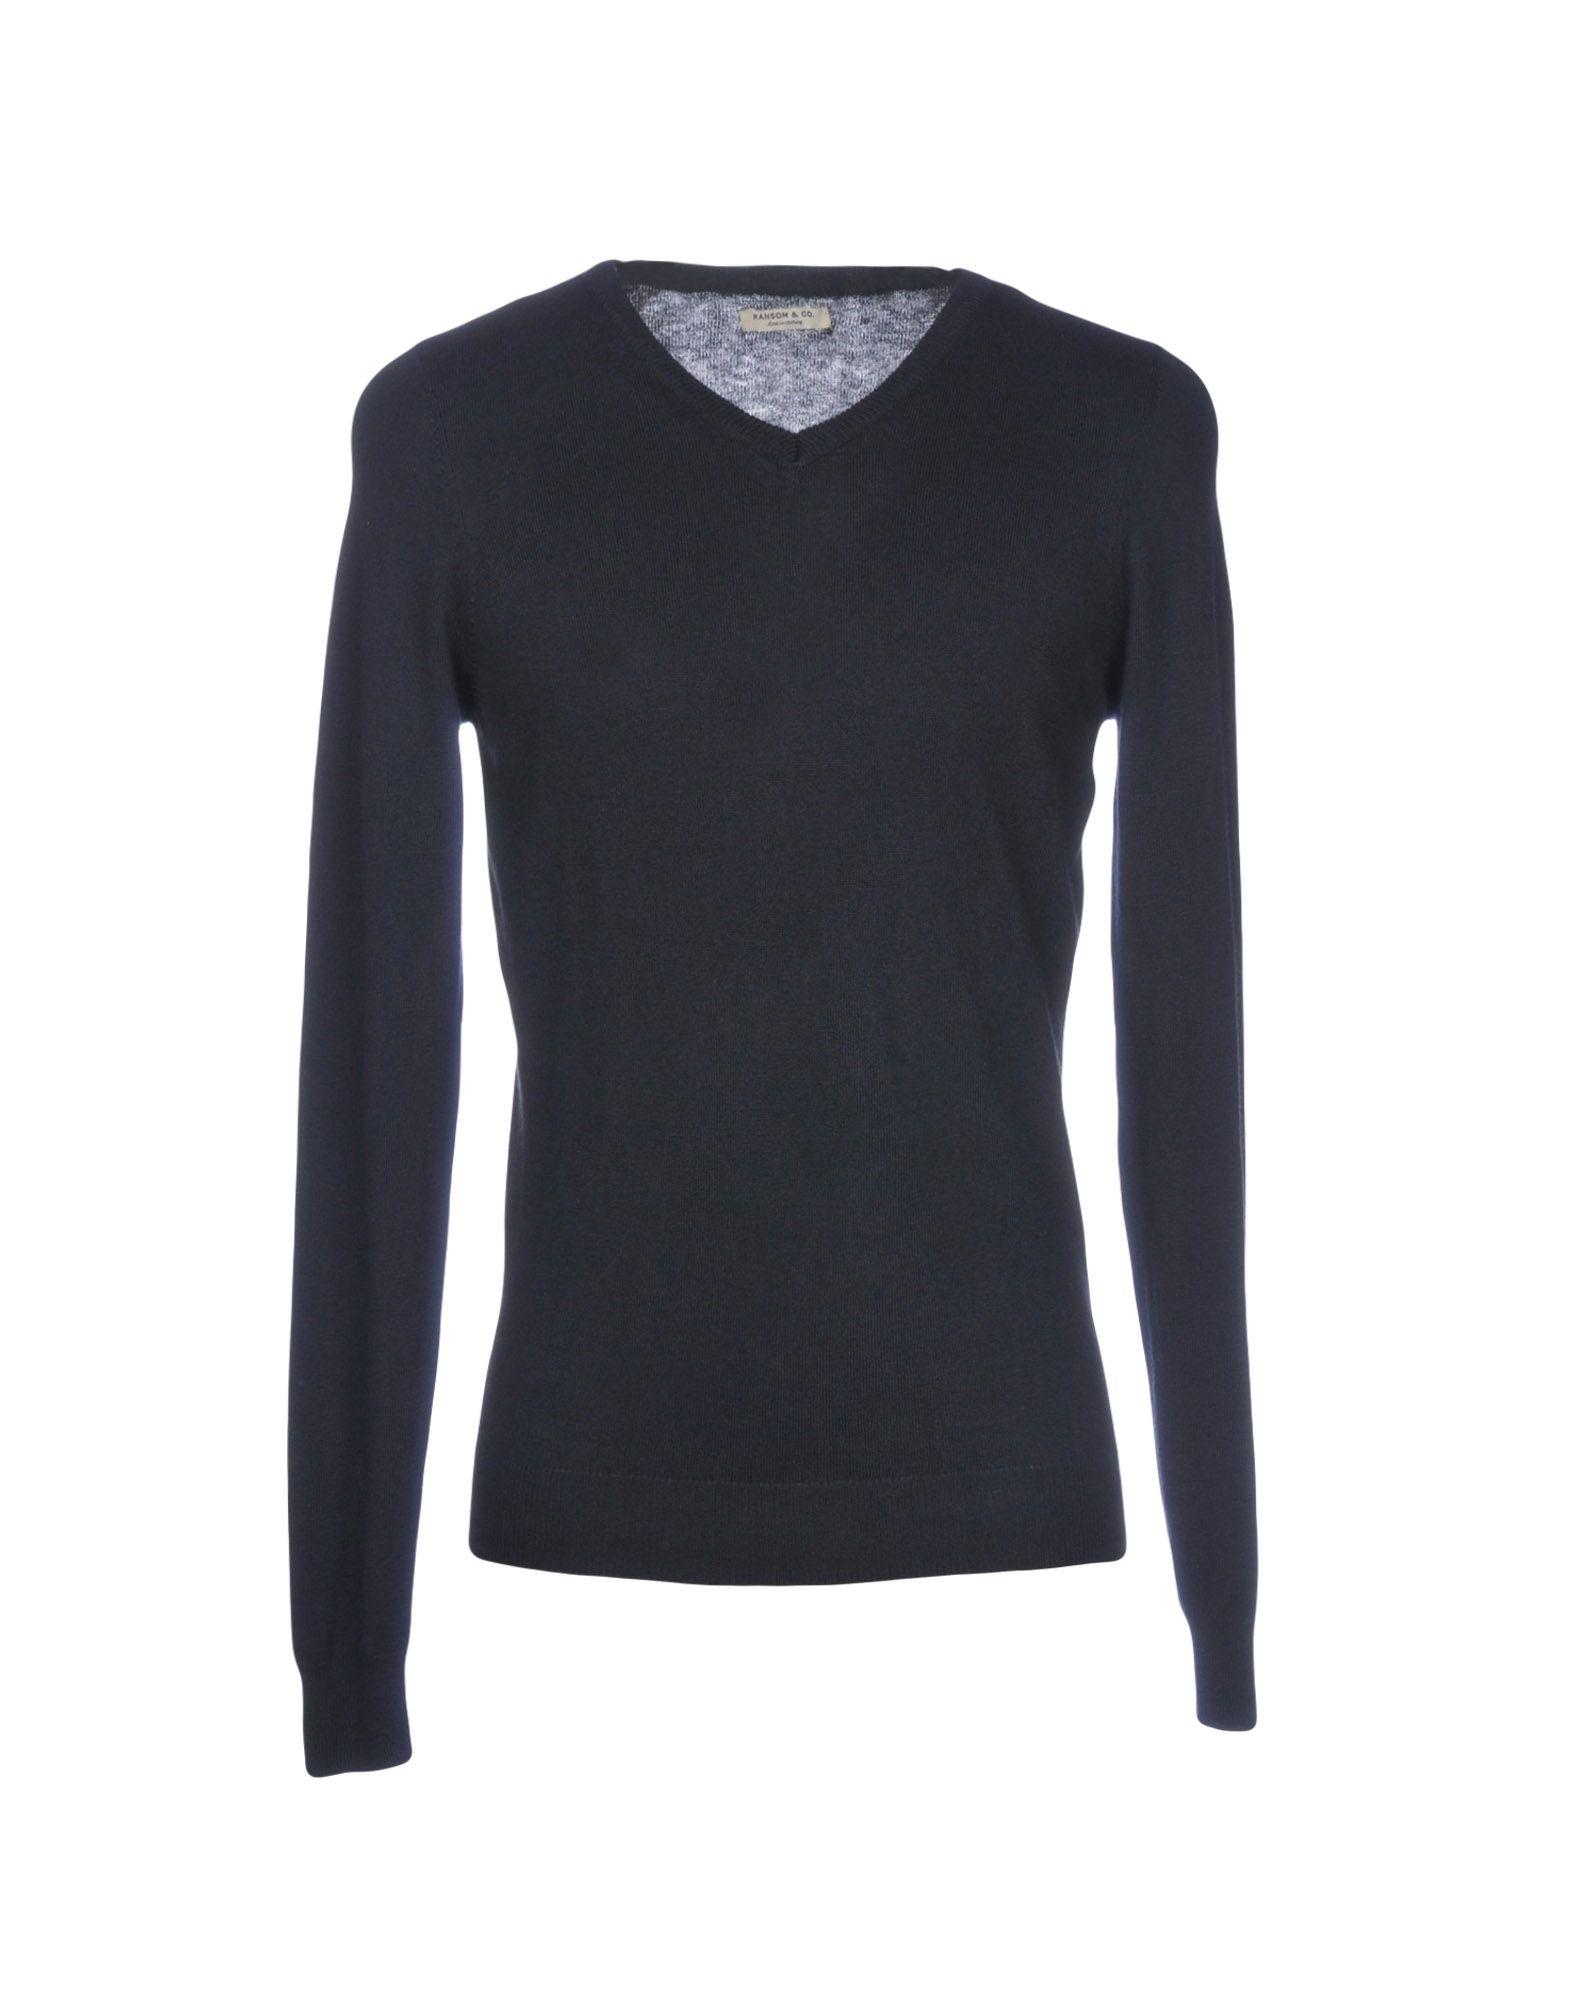 RANSOM Sweater in Dark Blue